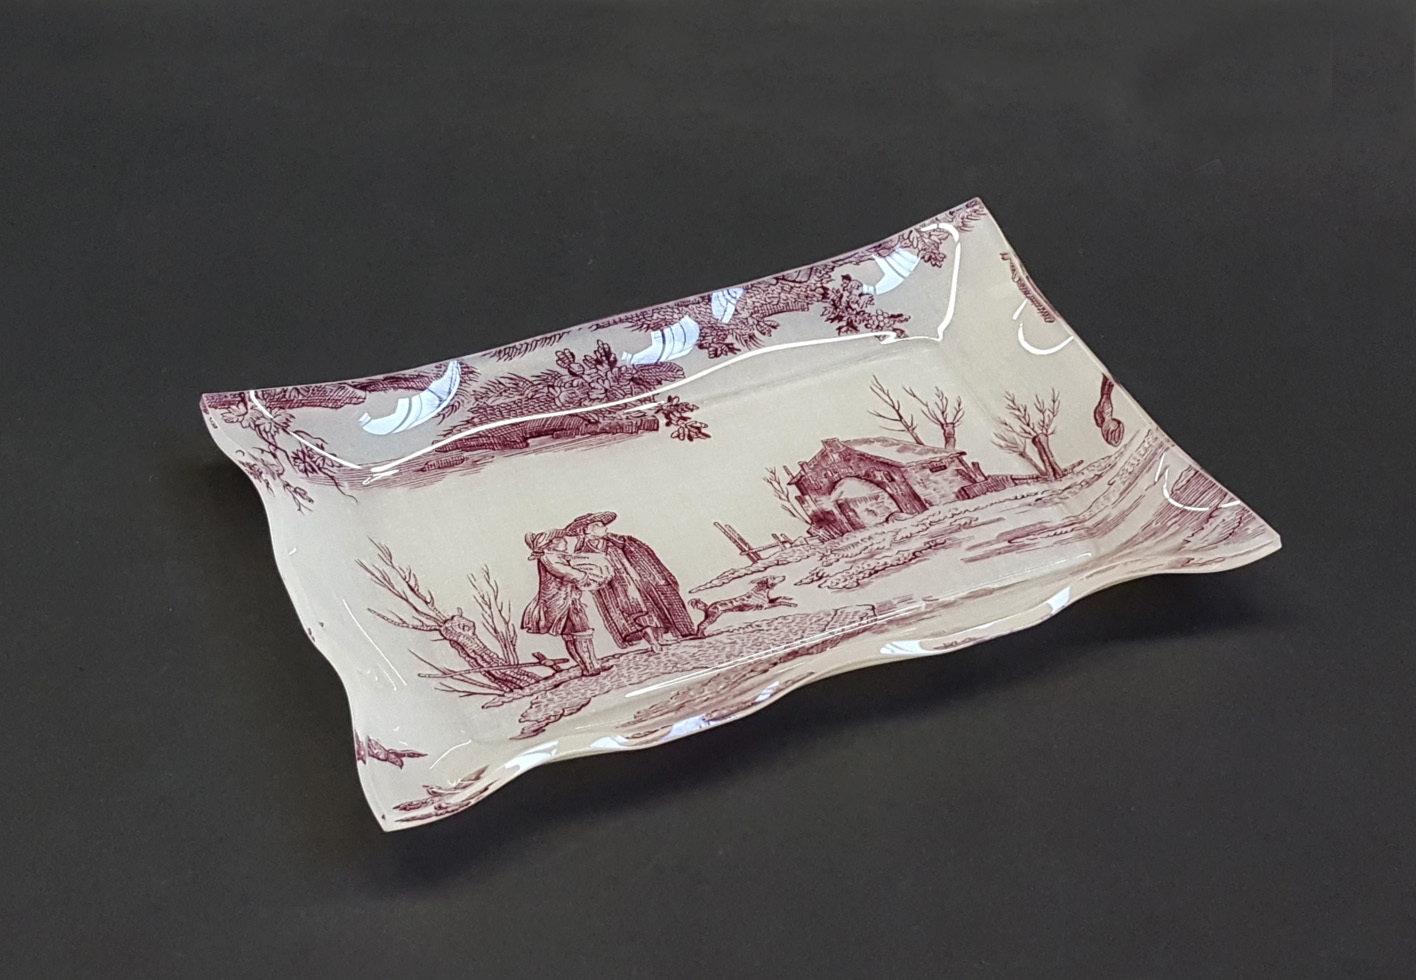 "Vuotatasche - vassoietto in plexiglass con tessuto ""Toile de jouy"" BORDEAUX"